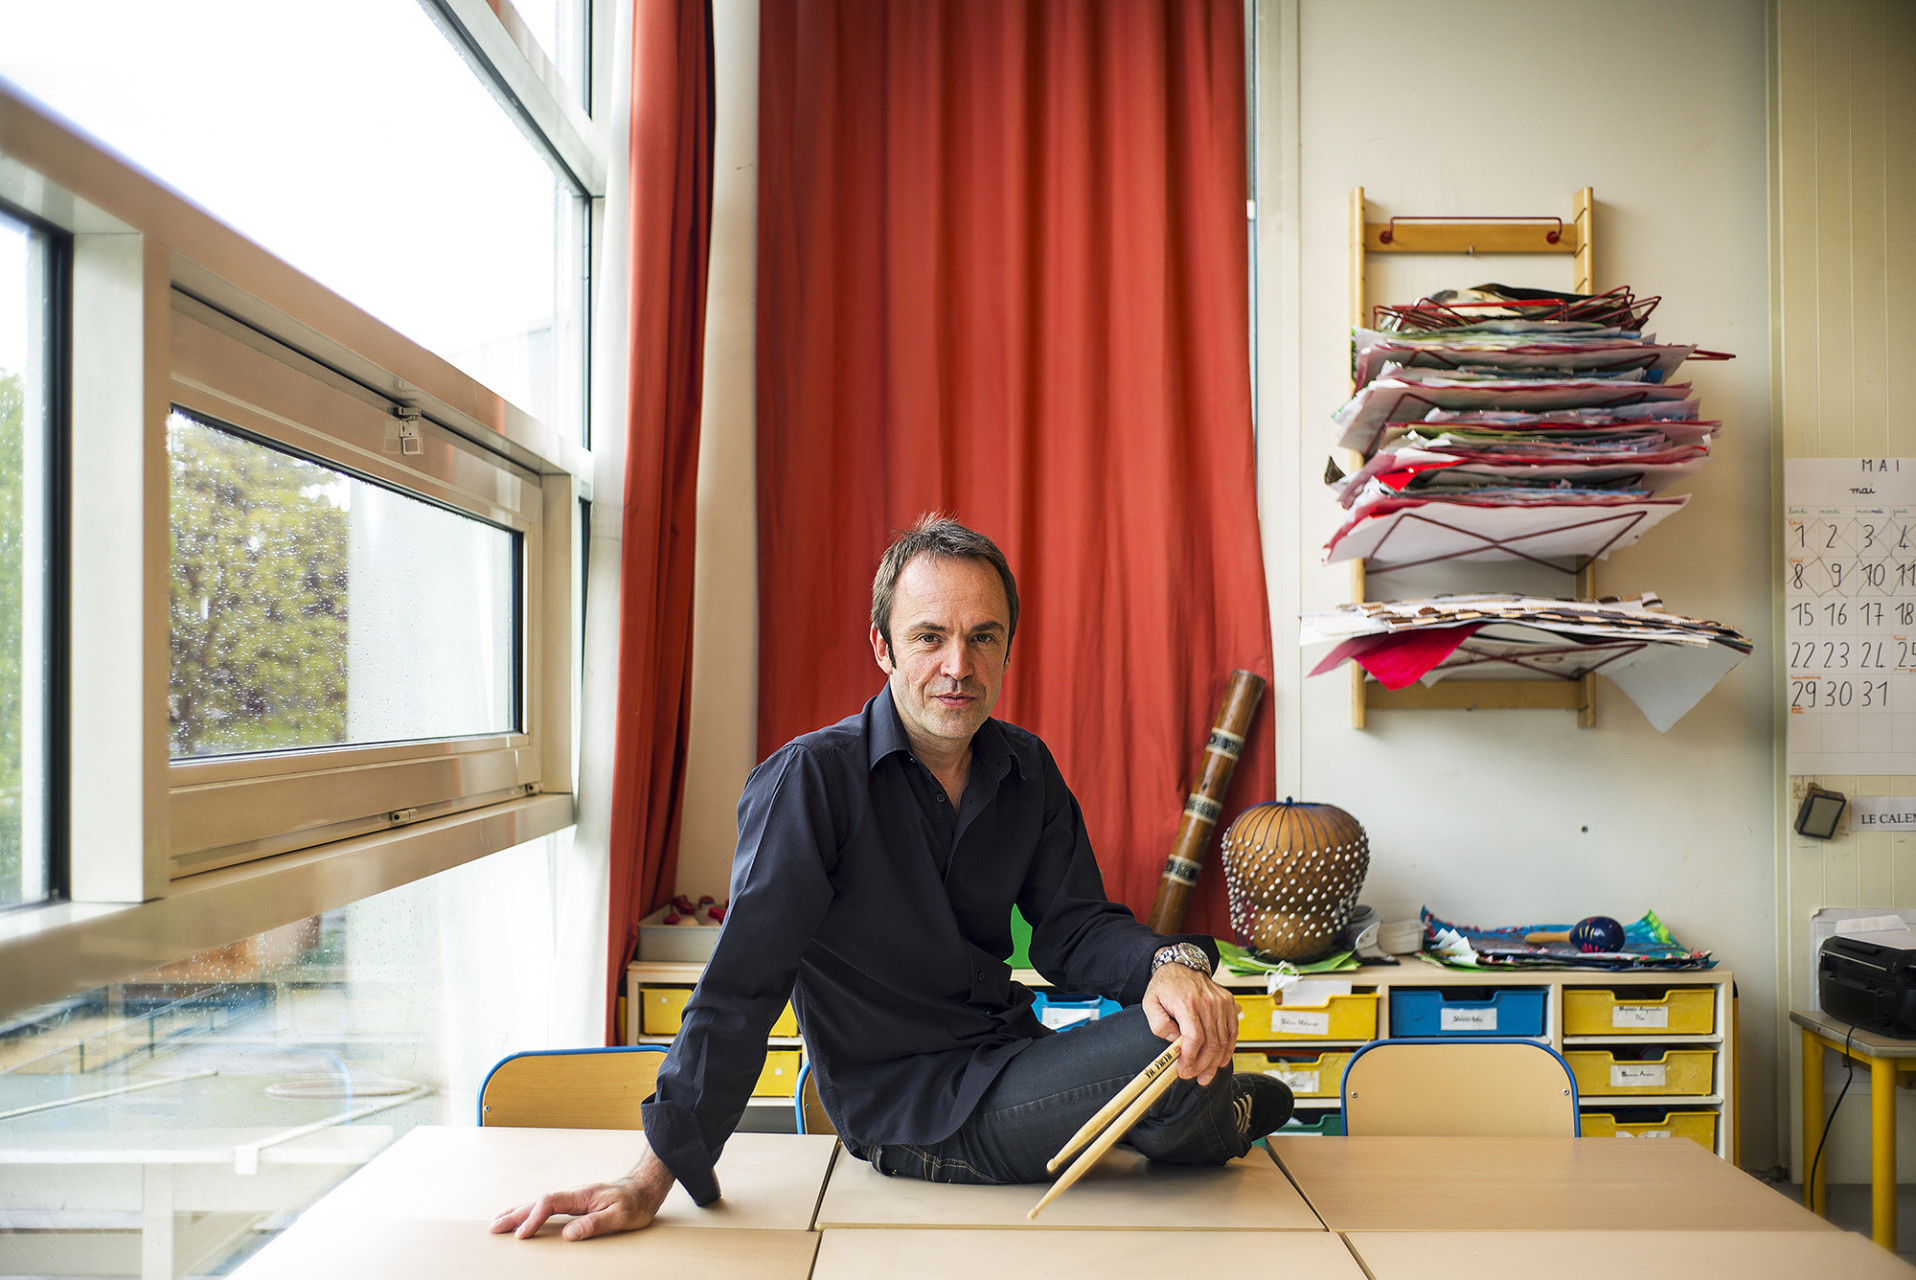 Franck Ballier, musicien - Pour Vitry Le Mensuel - mai 2017